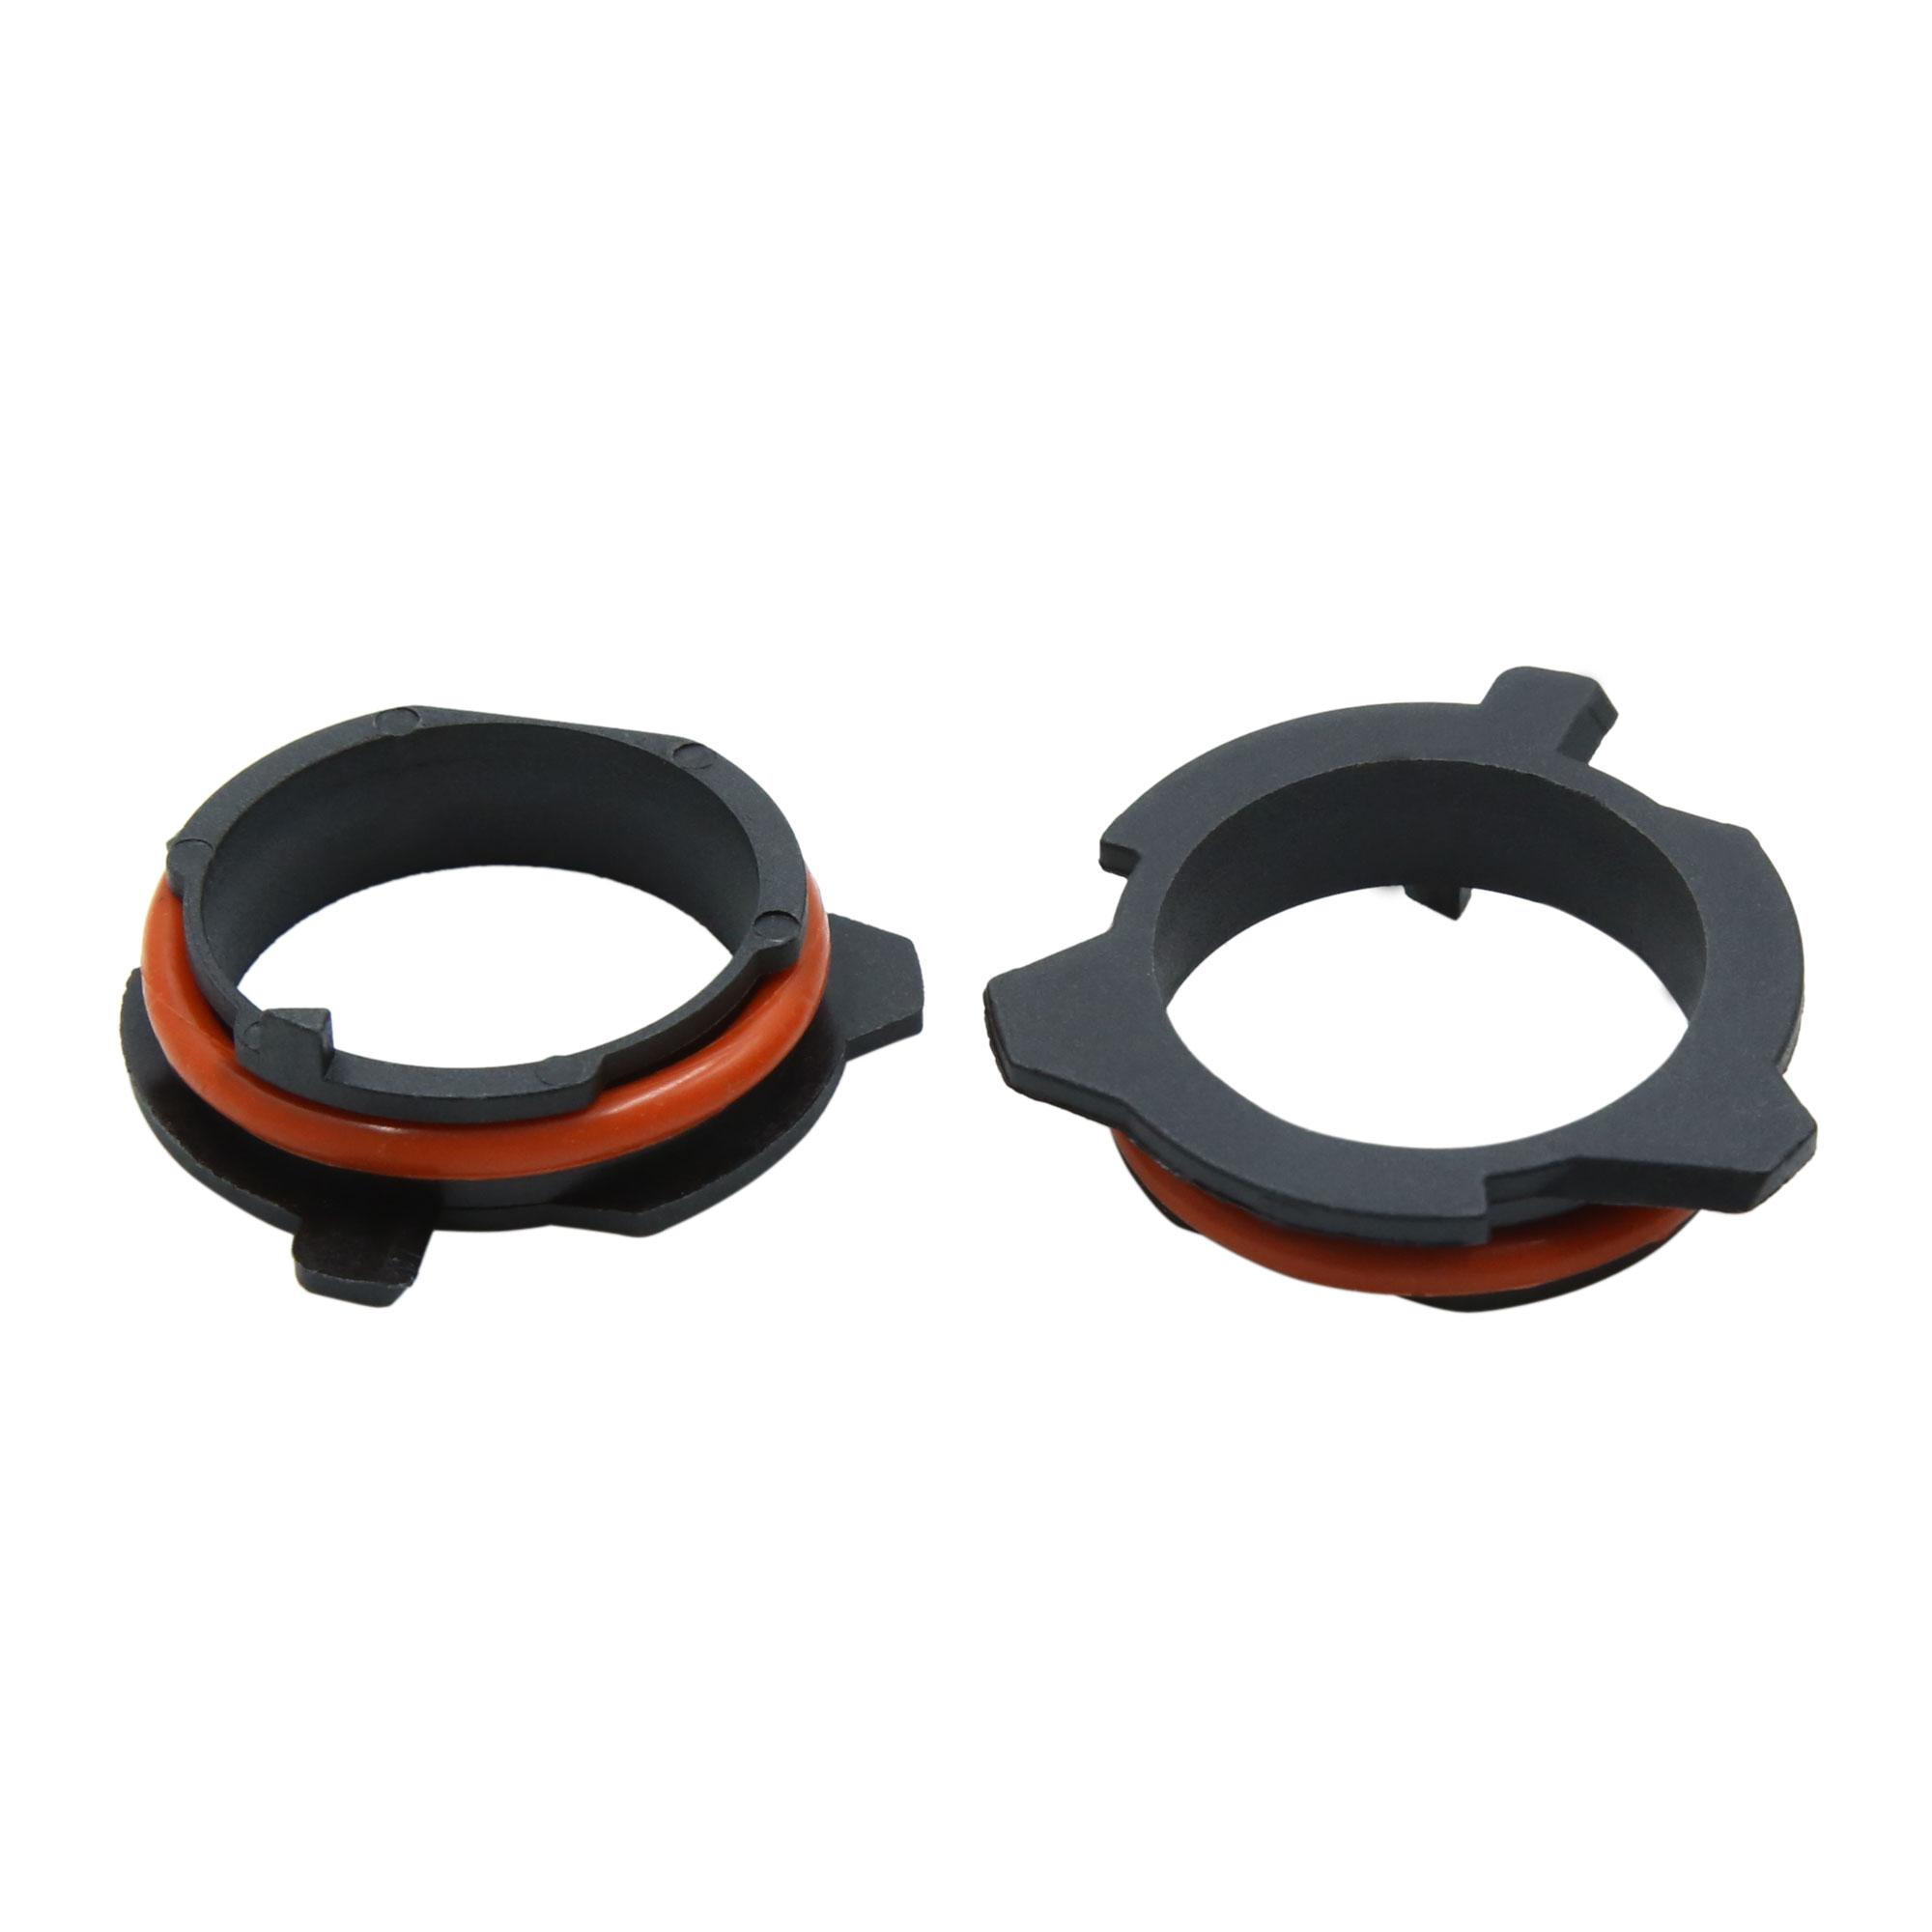 2pcs H7 Headlight Holder Bulb Retainer Aadpter for BMW E39 5 Series - image 1 de 3